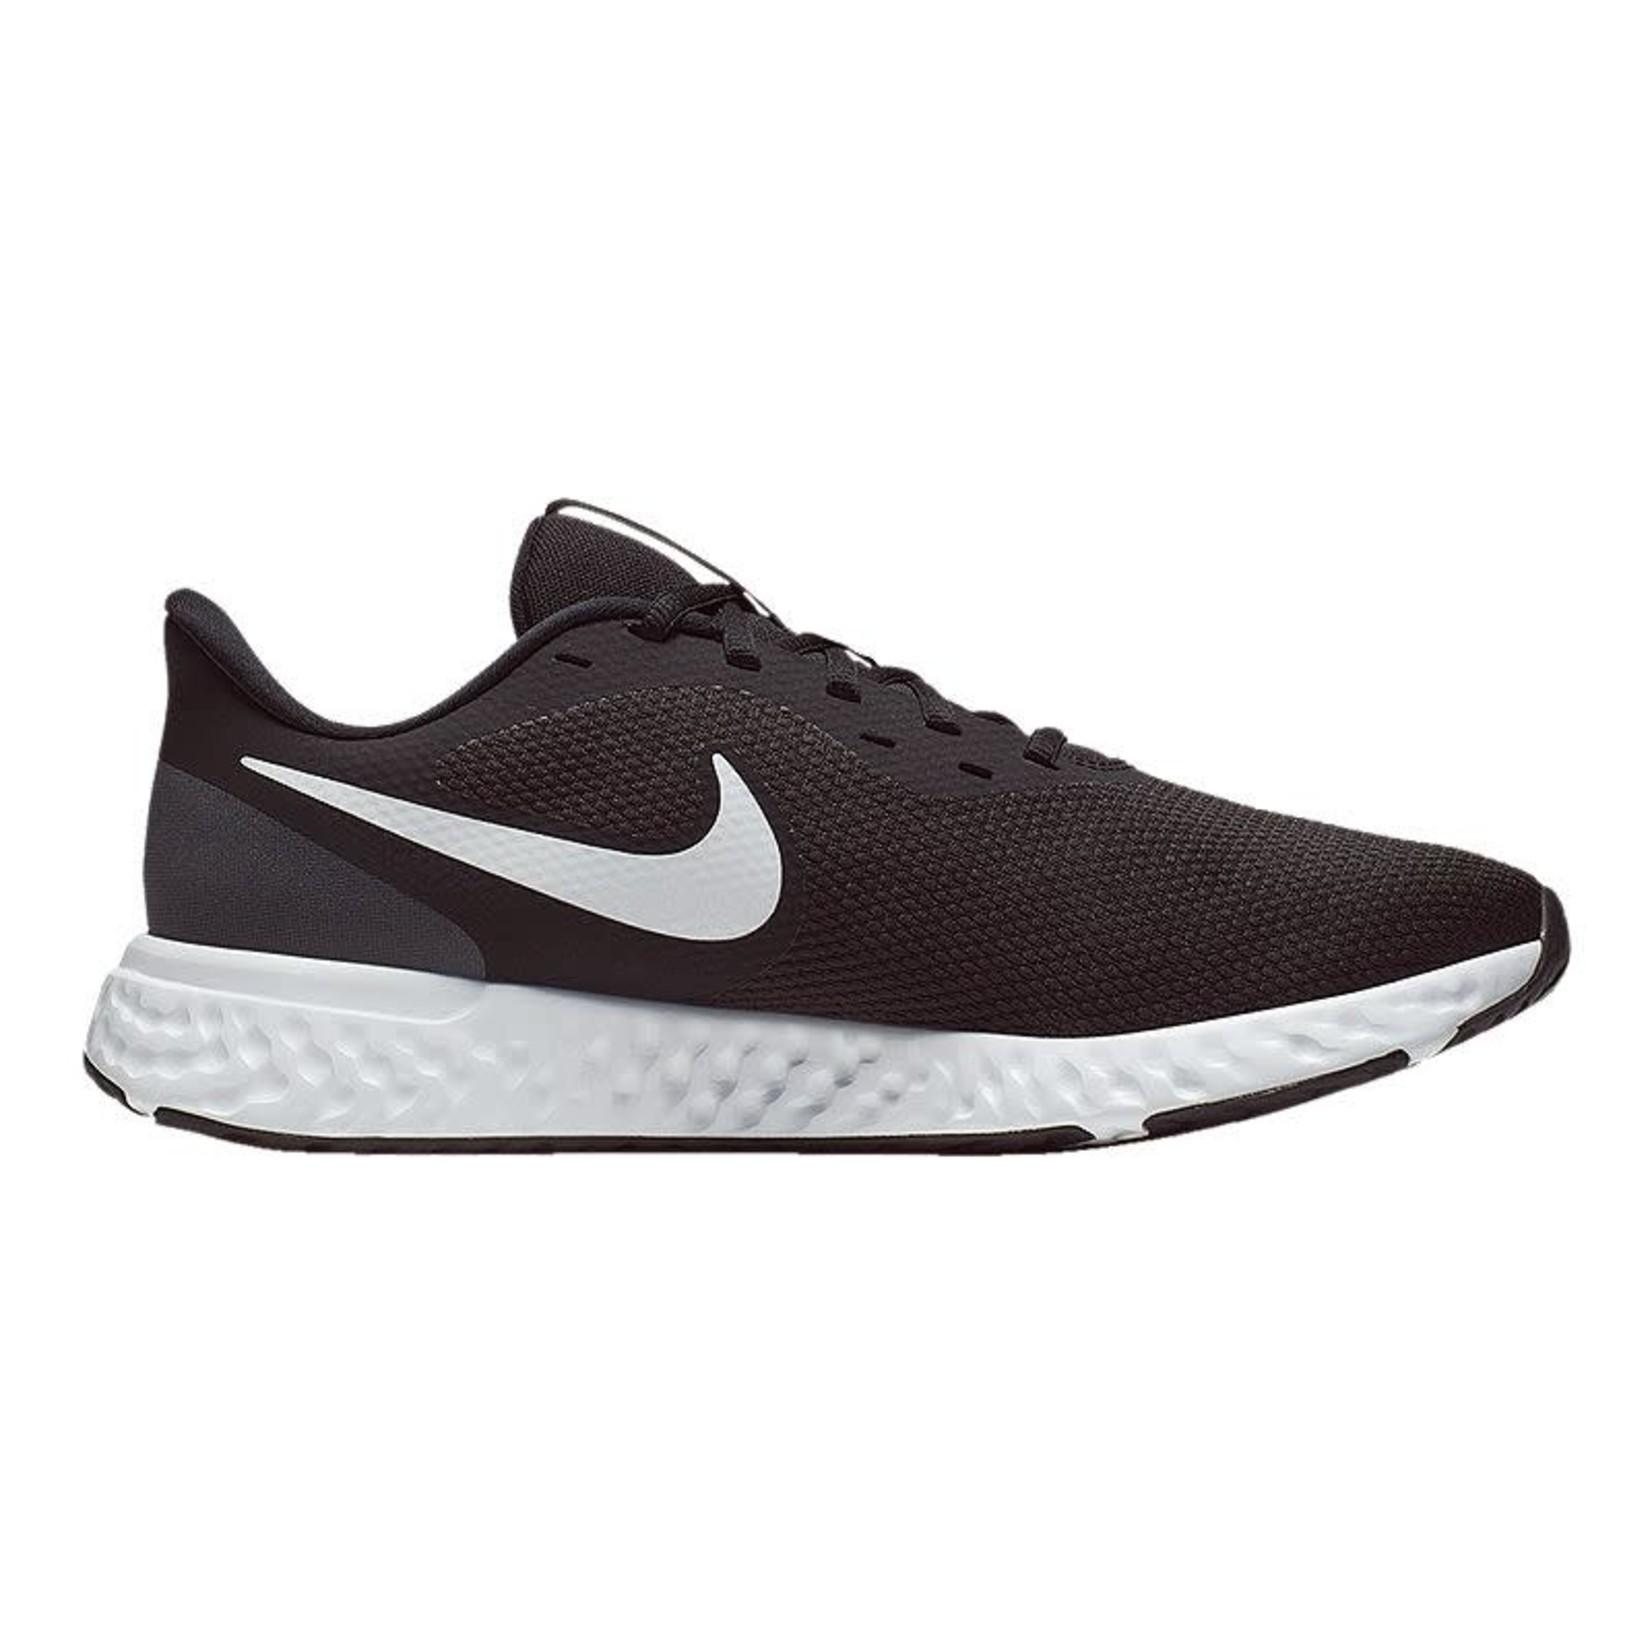 Nike Nike Running Shoes, Revolution 5, Mens